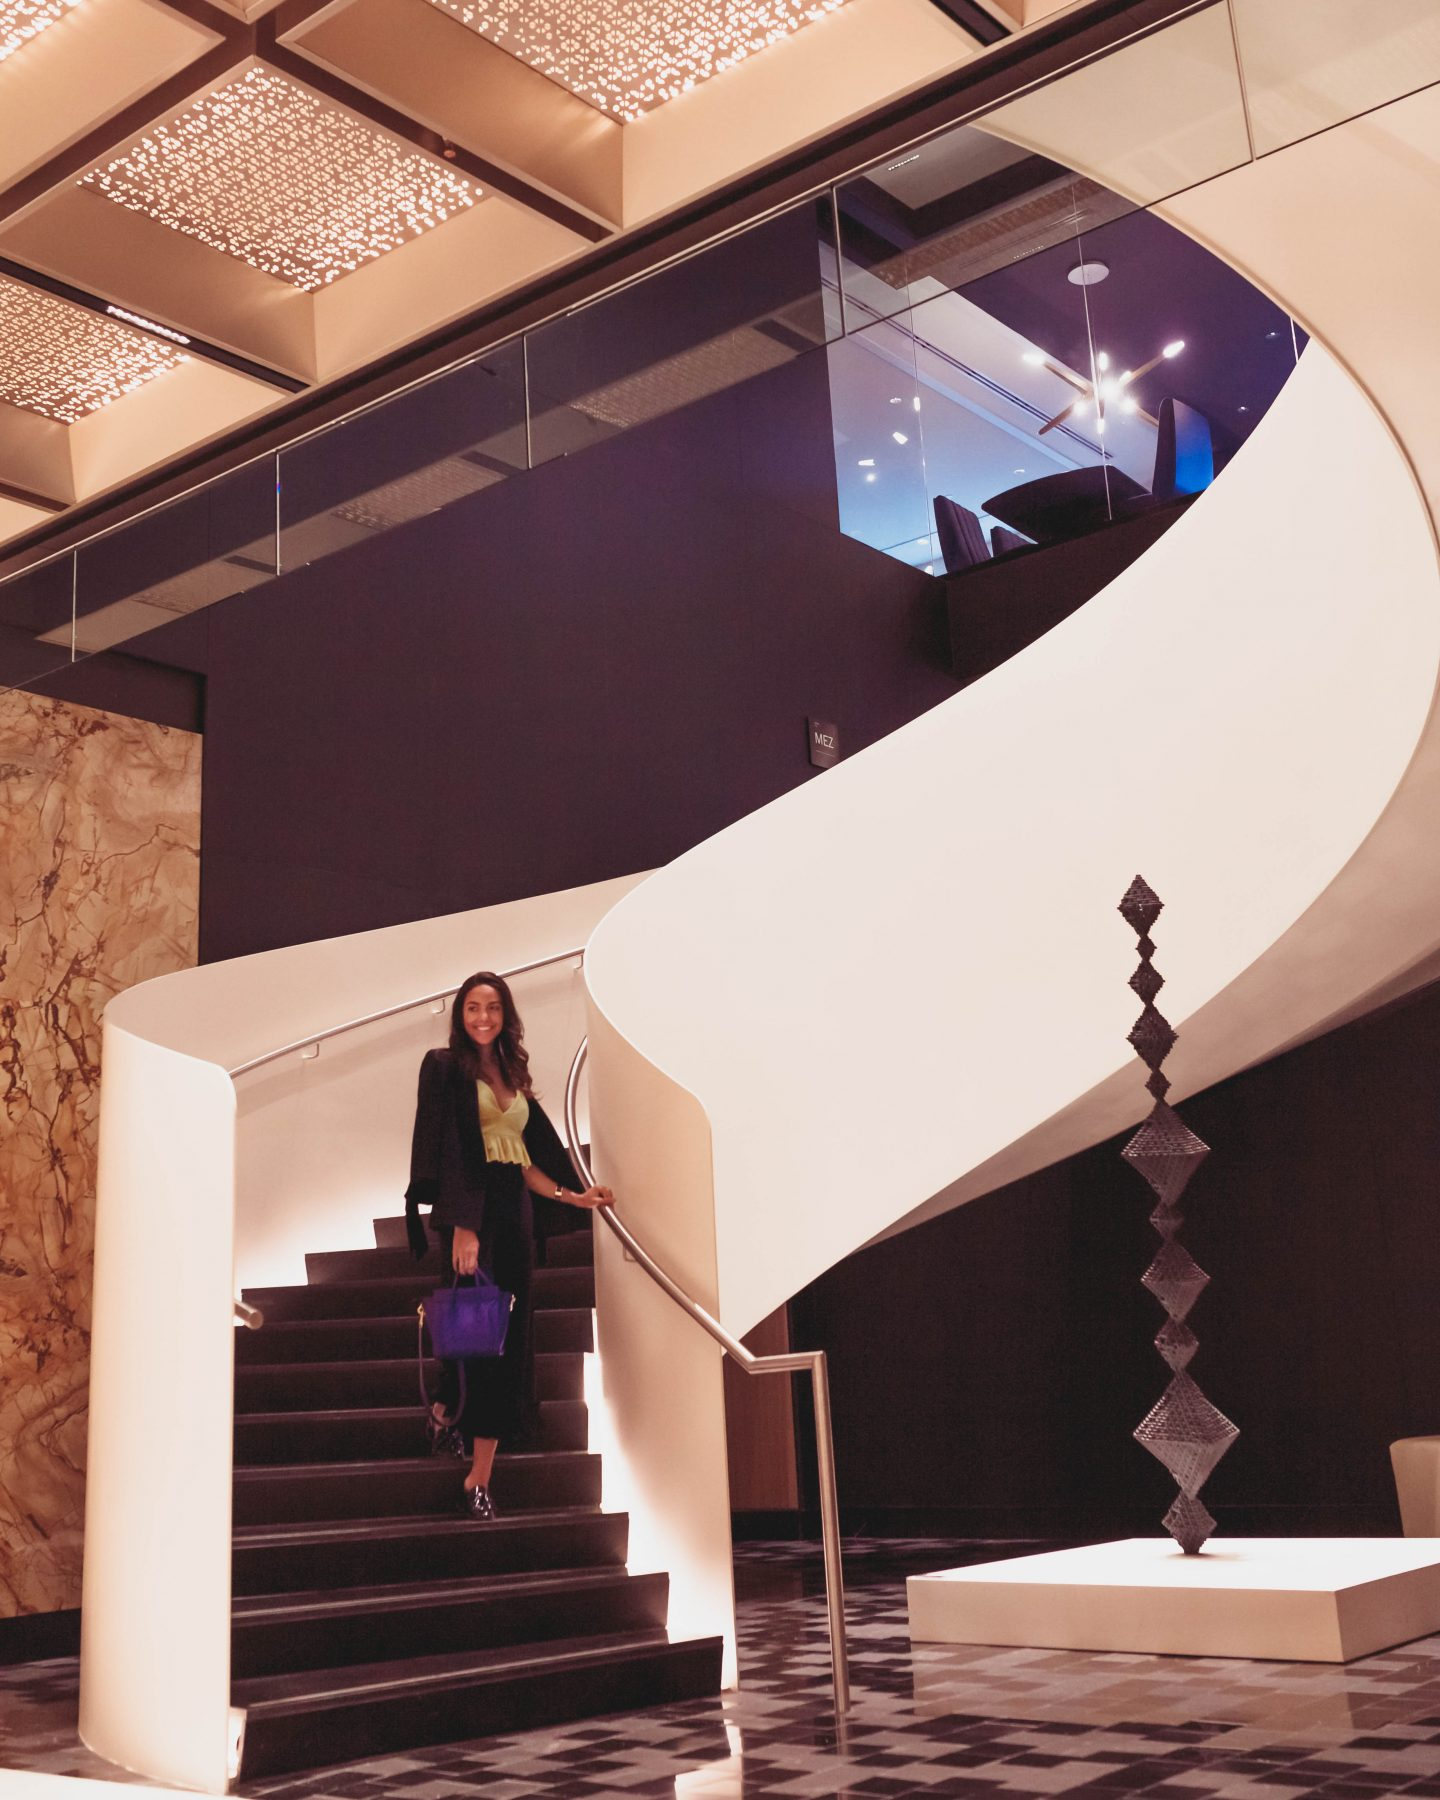 fairmont queen elizabeth lobby staircase